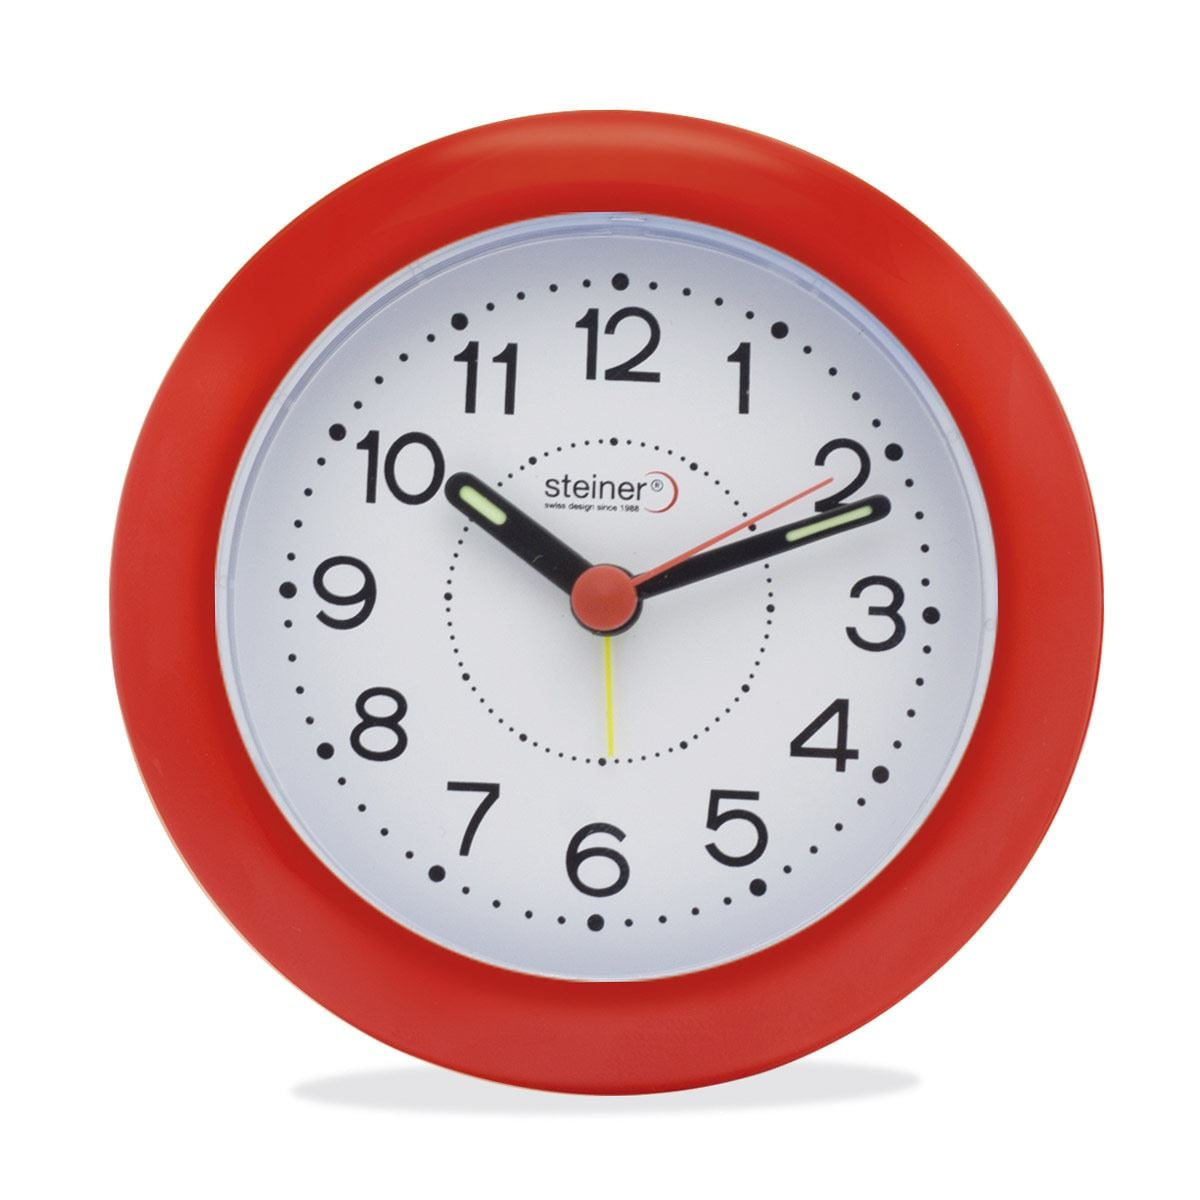 Reloj despertador RD301RD-R2 Steiner